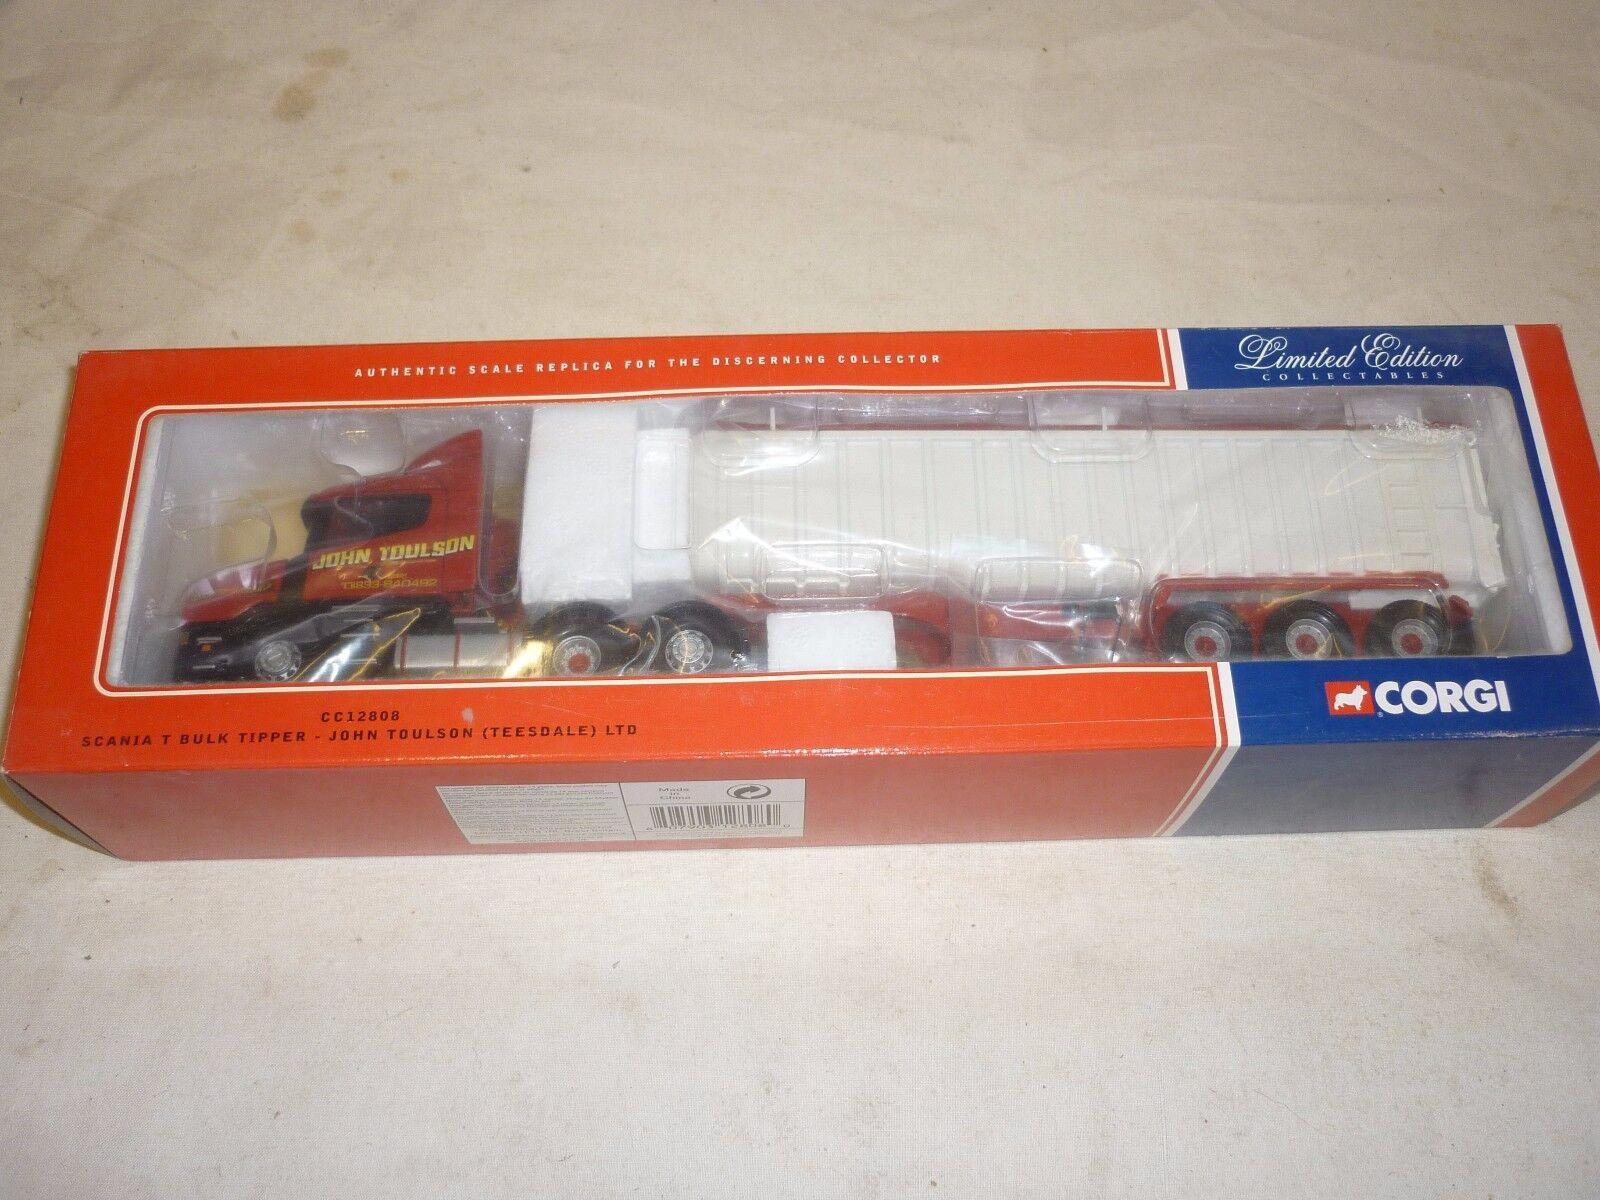 CORGI, CC 1280, Scania T Cab Avec Benne Remorque, John Toulson Teesdale Ltd.